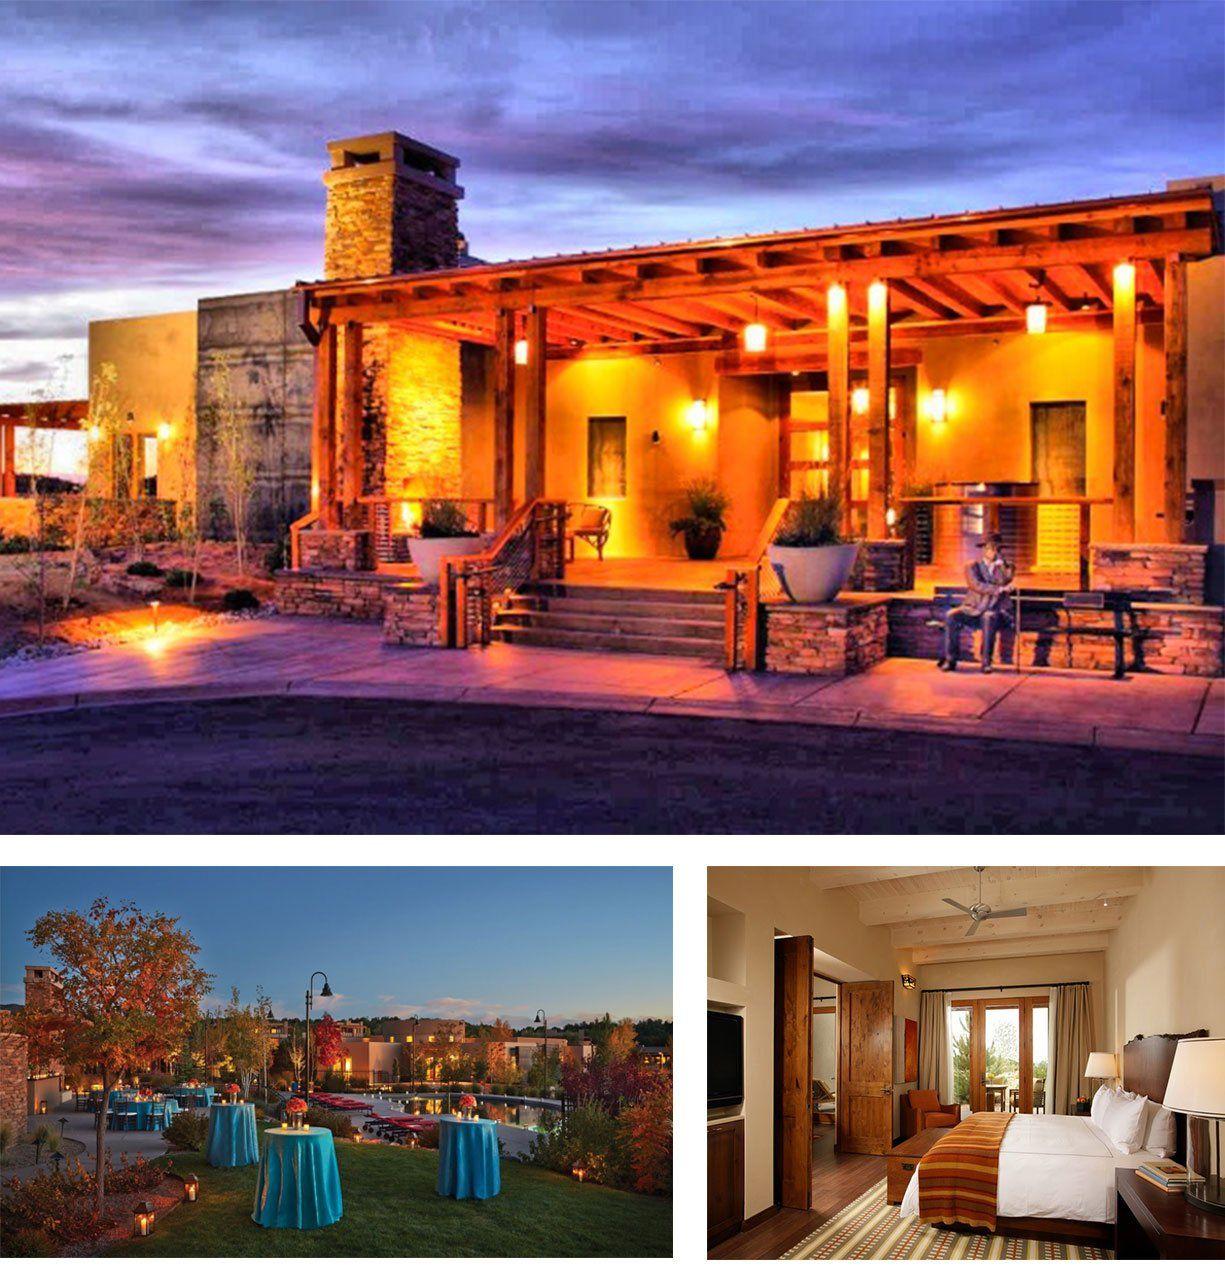 Rancho Santa Fe New Mexico: Win A Trip To Santa Fe, New Mexico And Stay At The Four